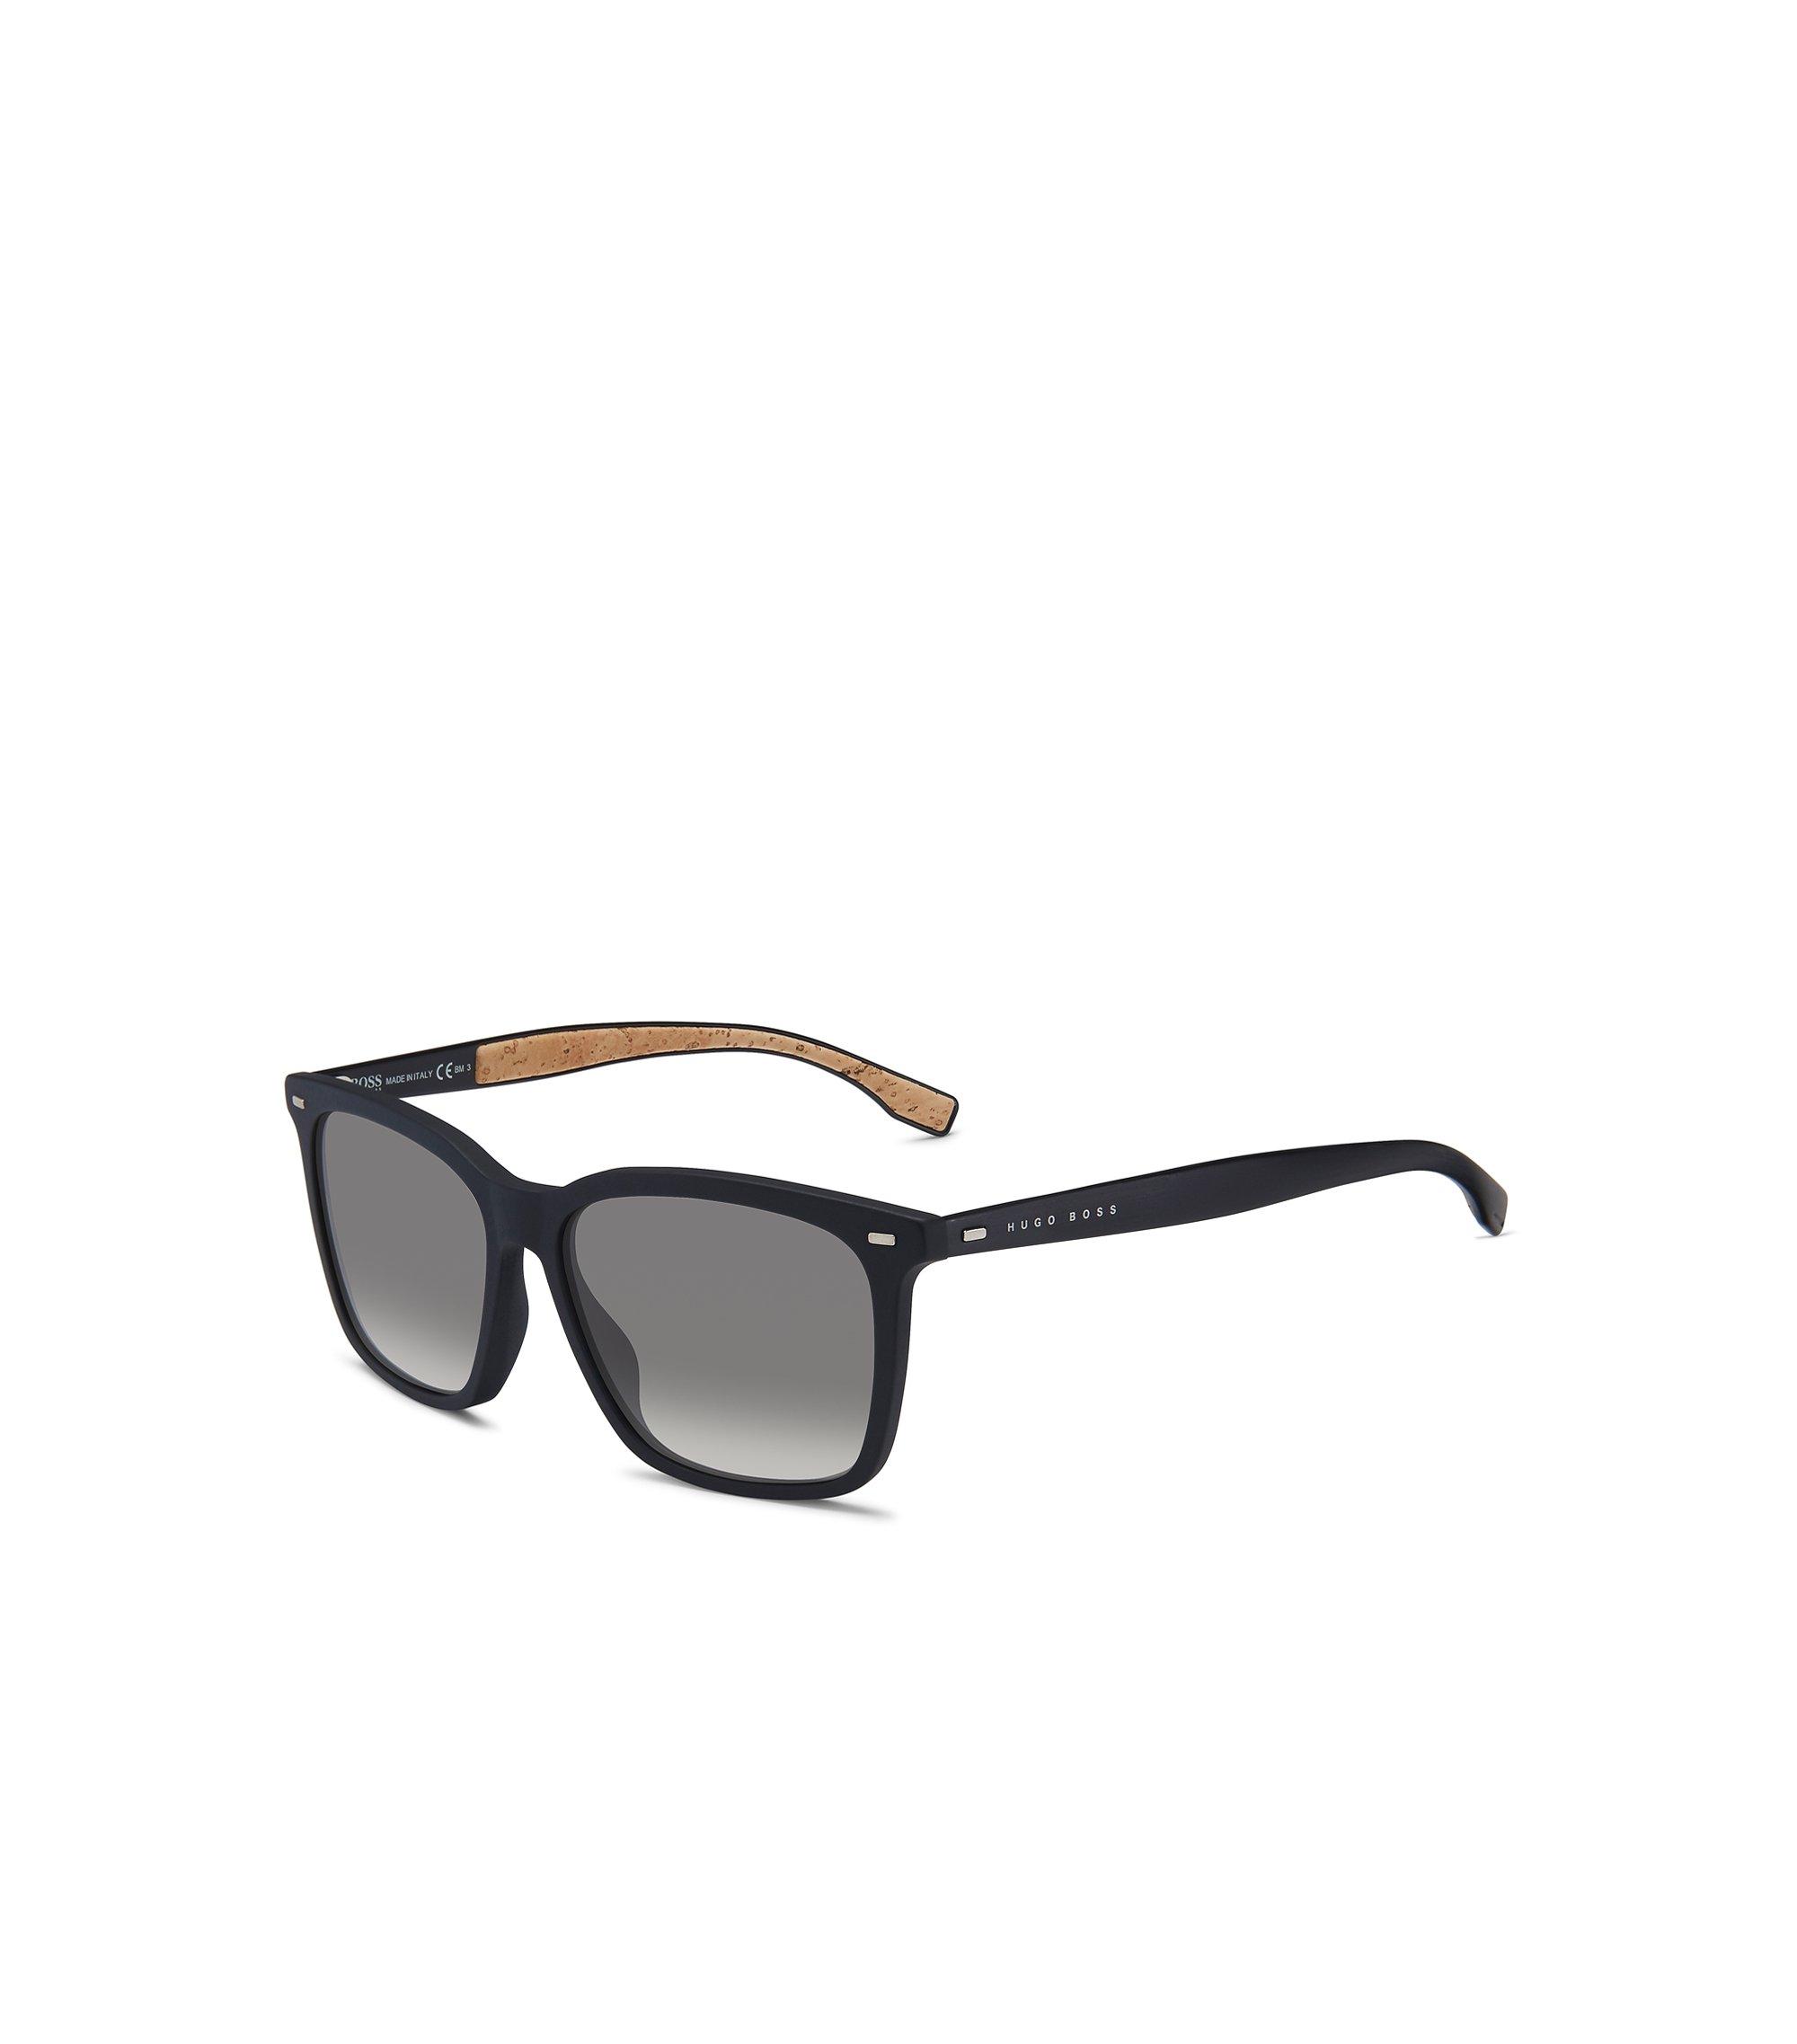 Black Acetate Rectangular Sunglasses | BOSS 0883S, Assorted-Pre-Pack